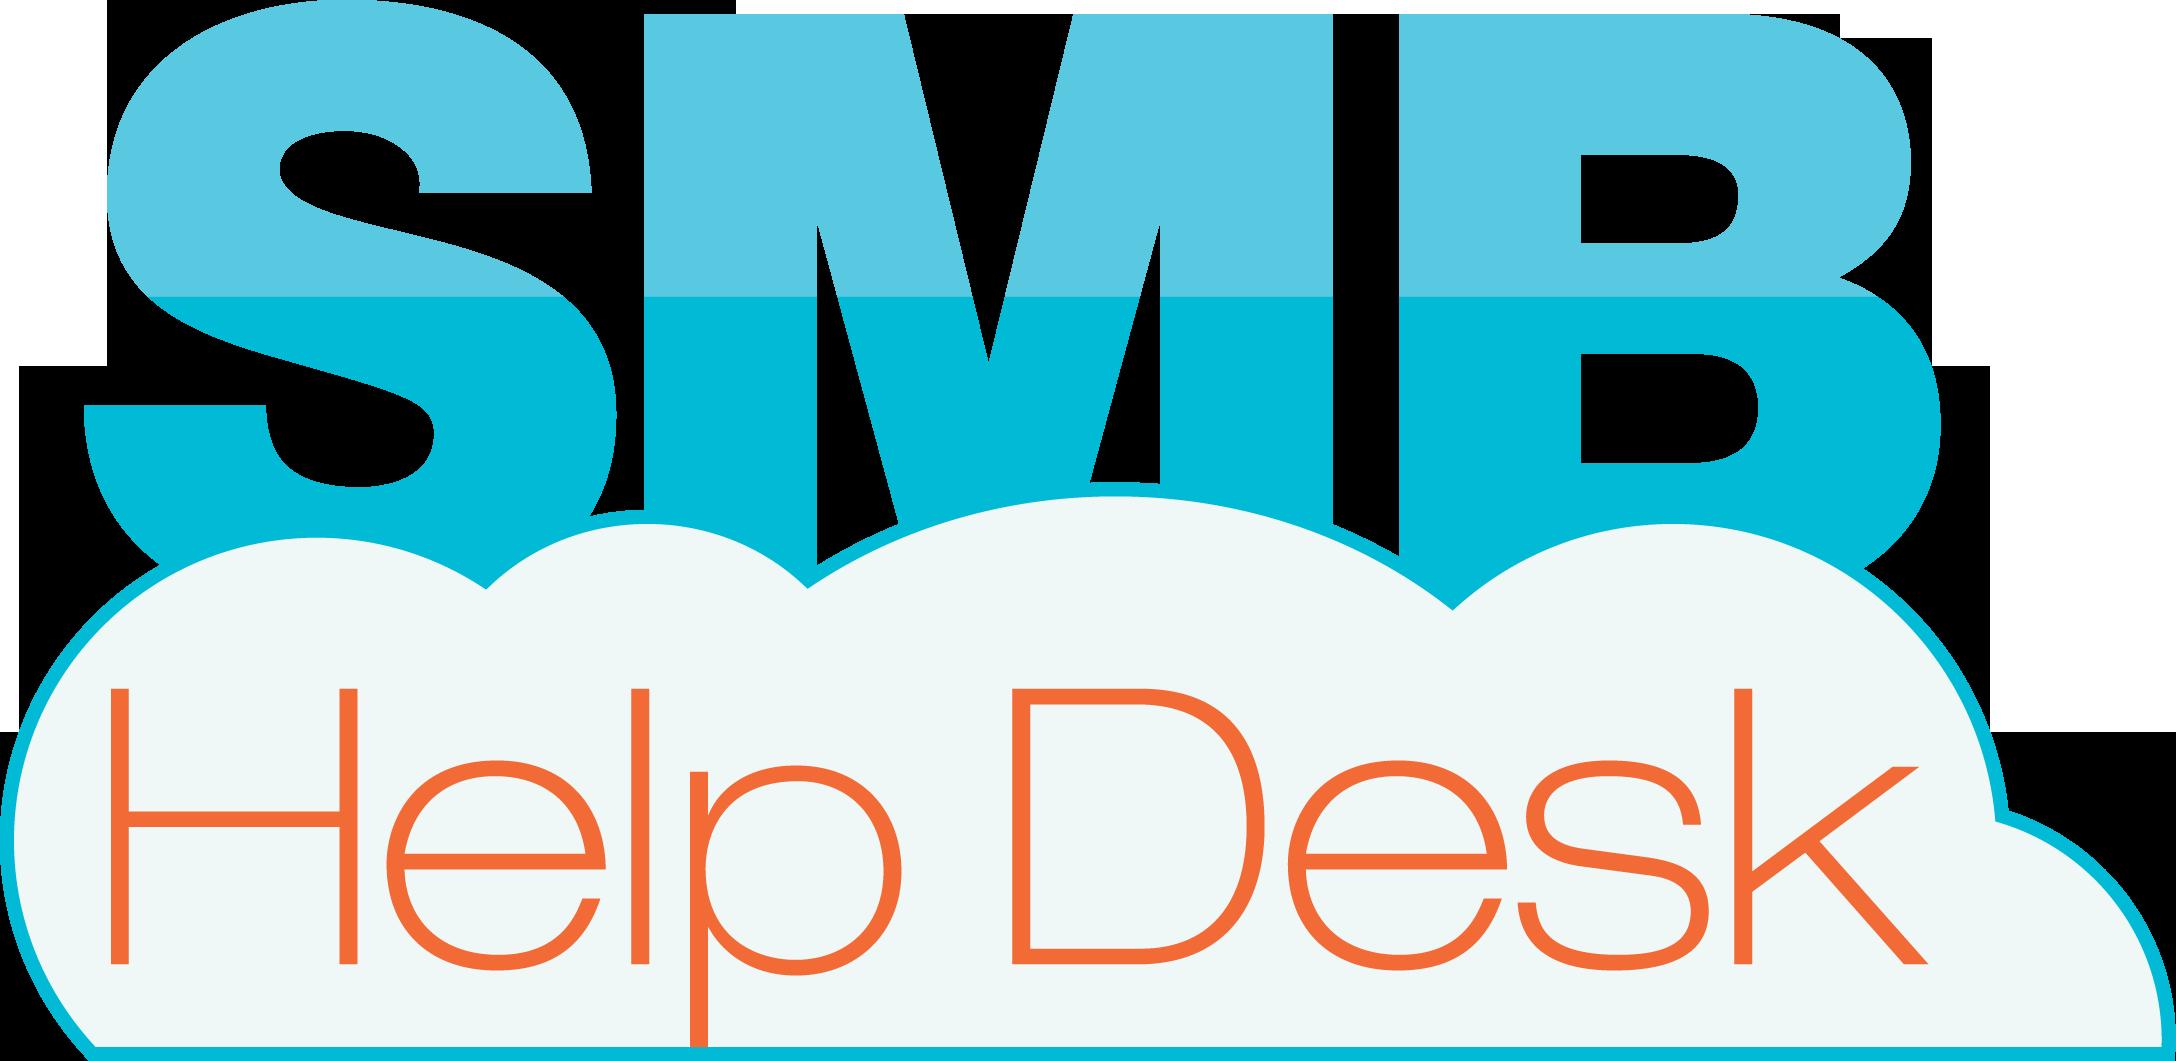 The SMB Help Desk